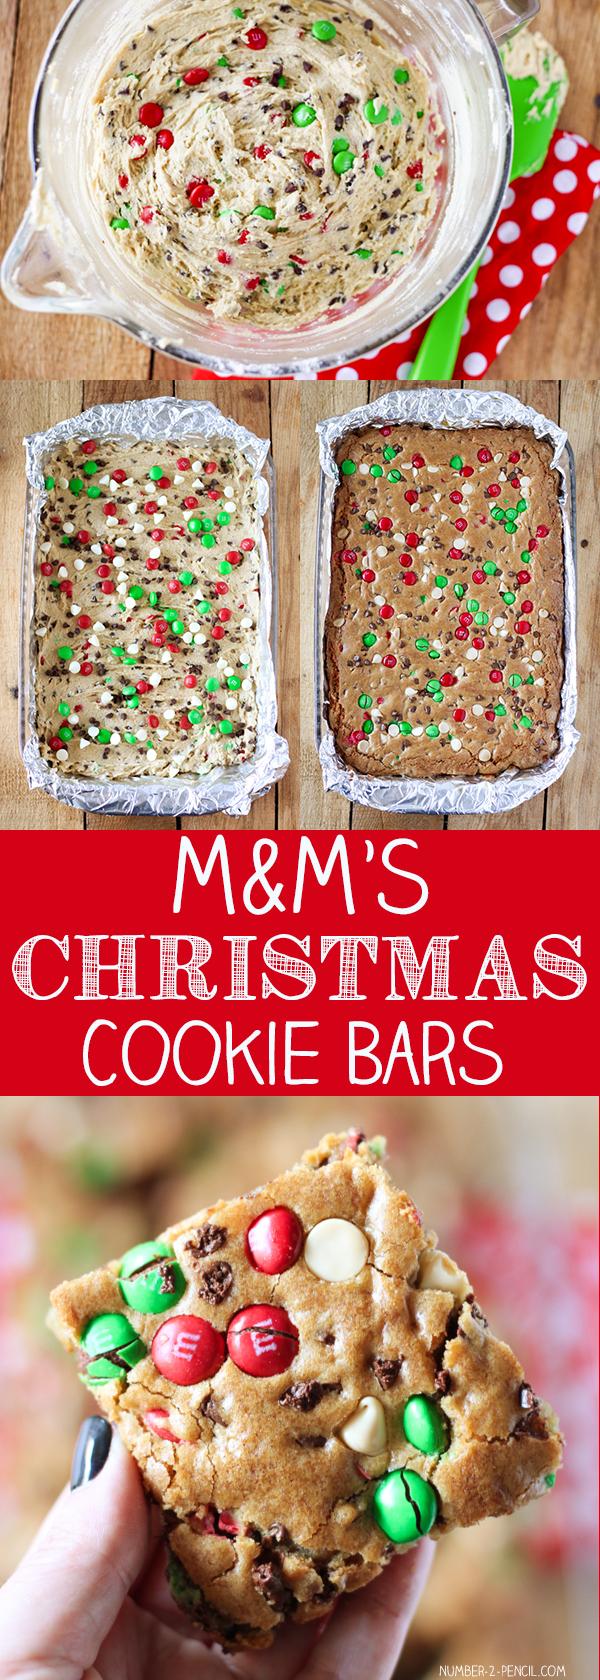 M&M'S Christmas Cookie Bars 50 mins to make, makes 18-36